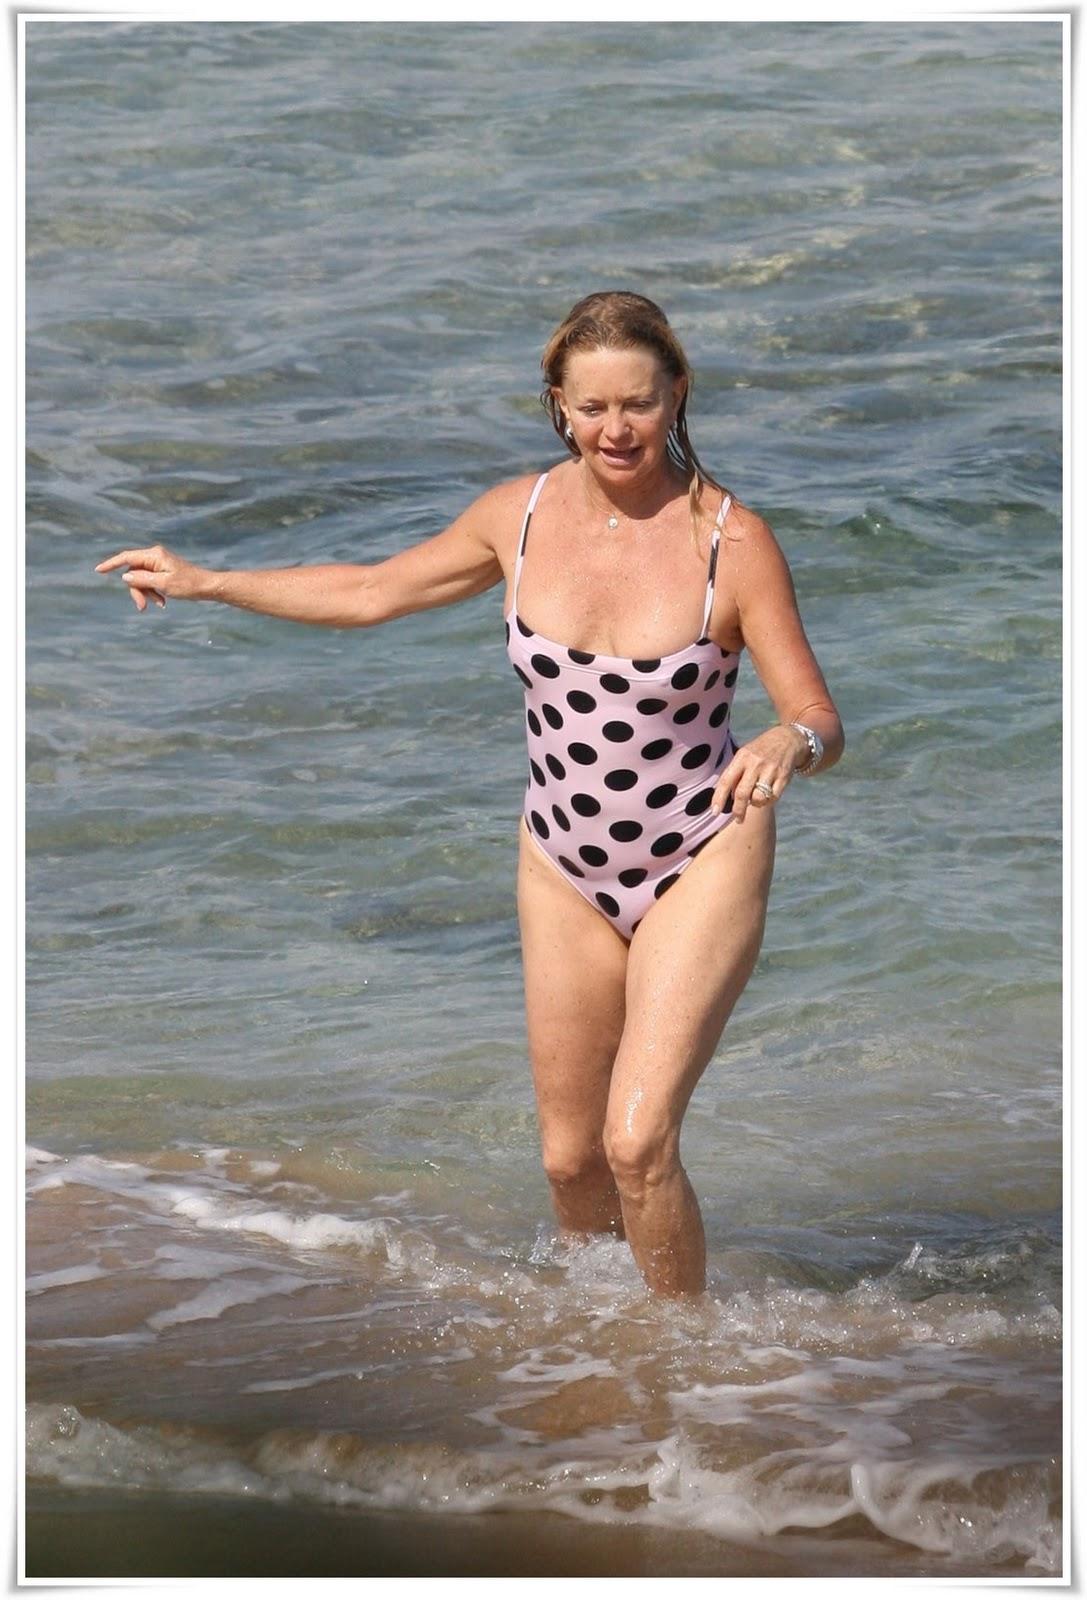 http://2.bp.blogspot.com/_cNo_aOISmn8/TFFG1dV683I/AAAAAAAAAHM/LATgXGueu6I/s1600/goldie_hawn_swimsuit_big.jpg